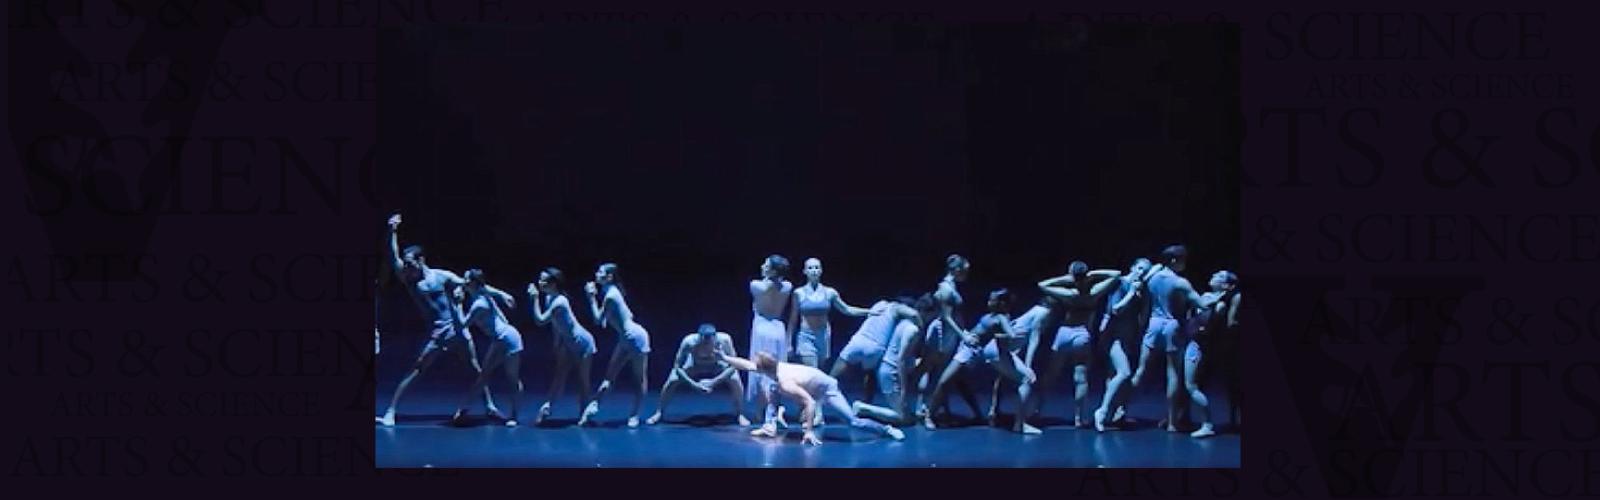 Vanderbilt partnership with Nashville Ballet examines changing ideas of masculinity and gender